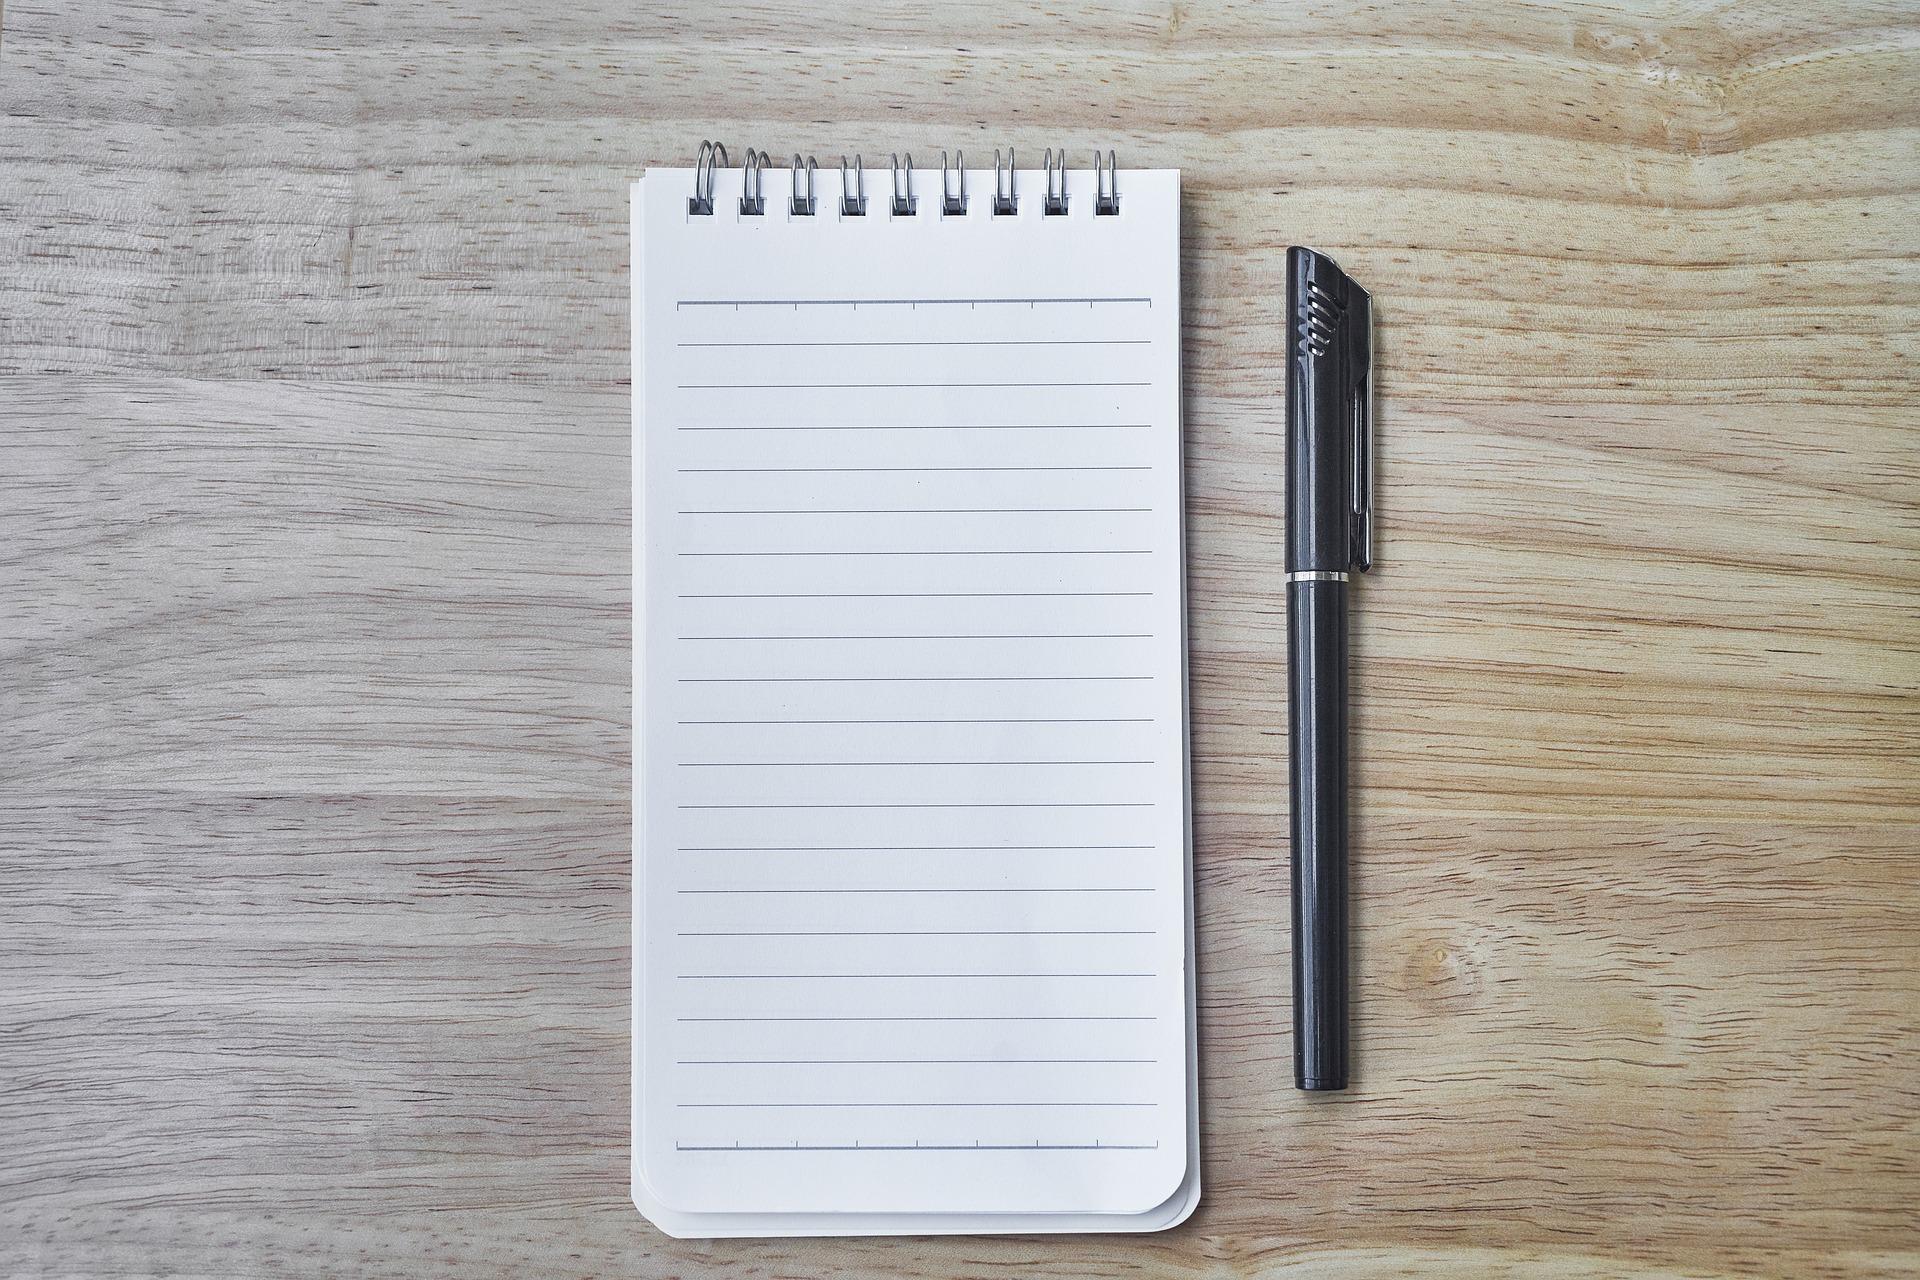 Notatnik (pixaby.com)